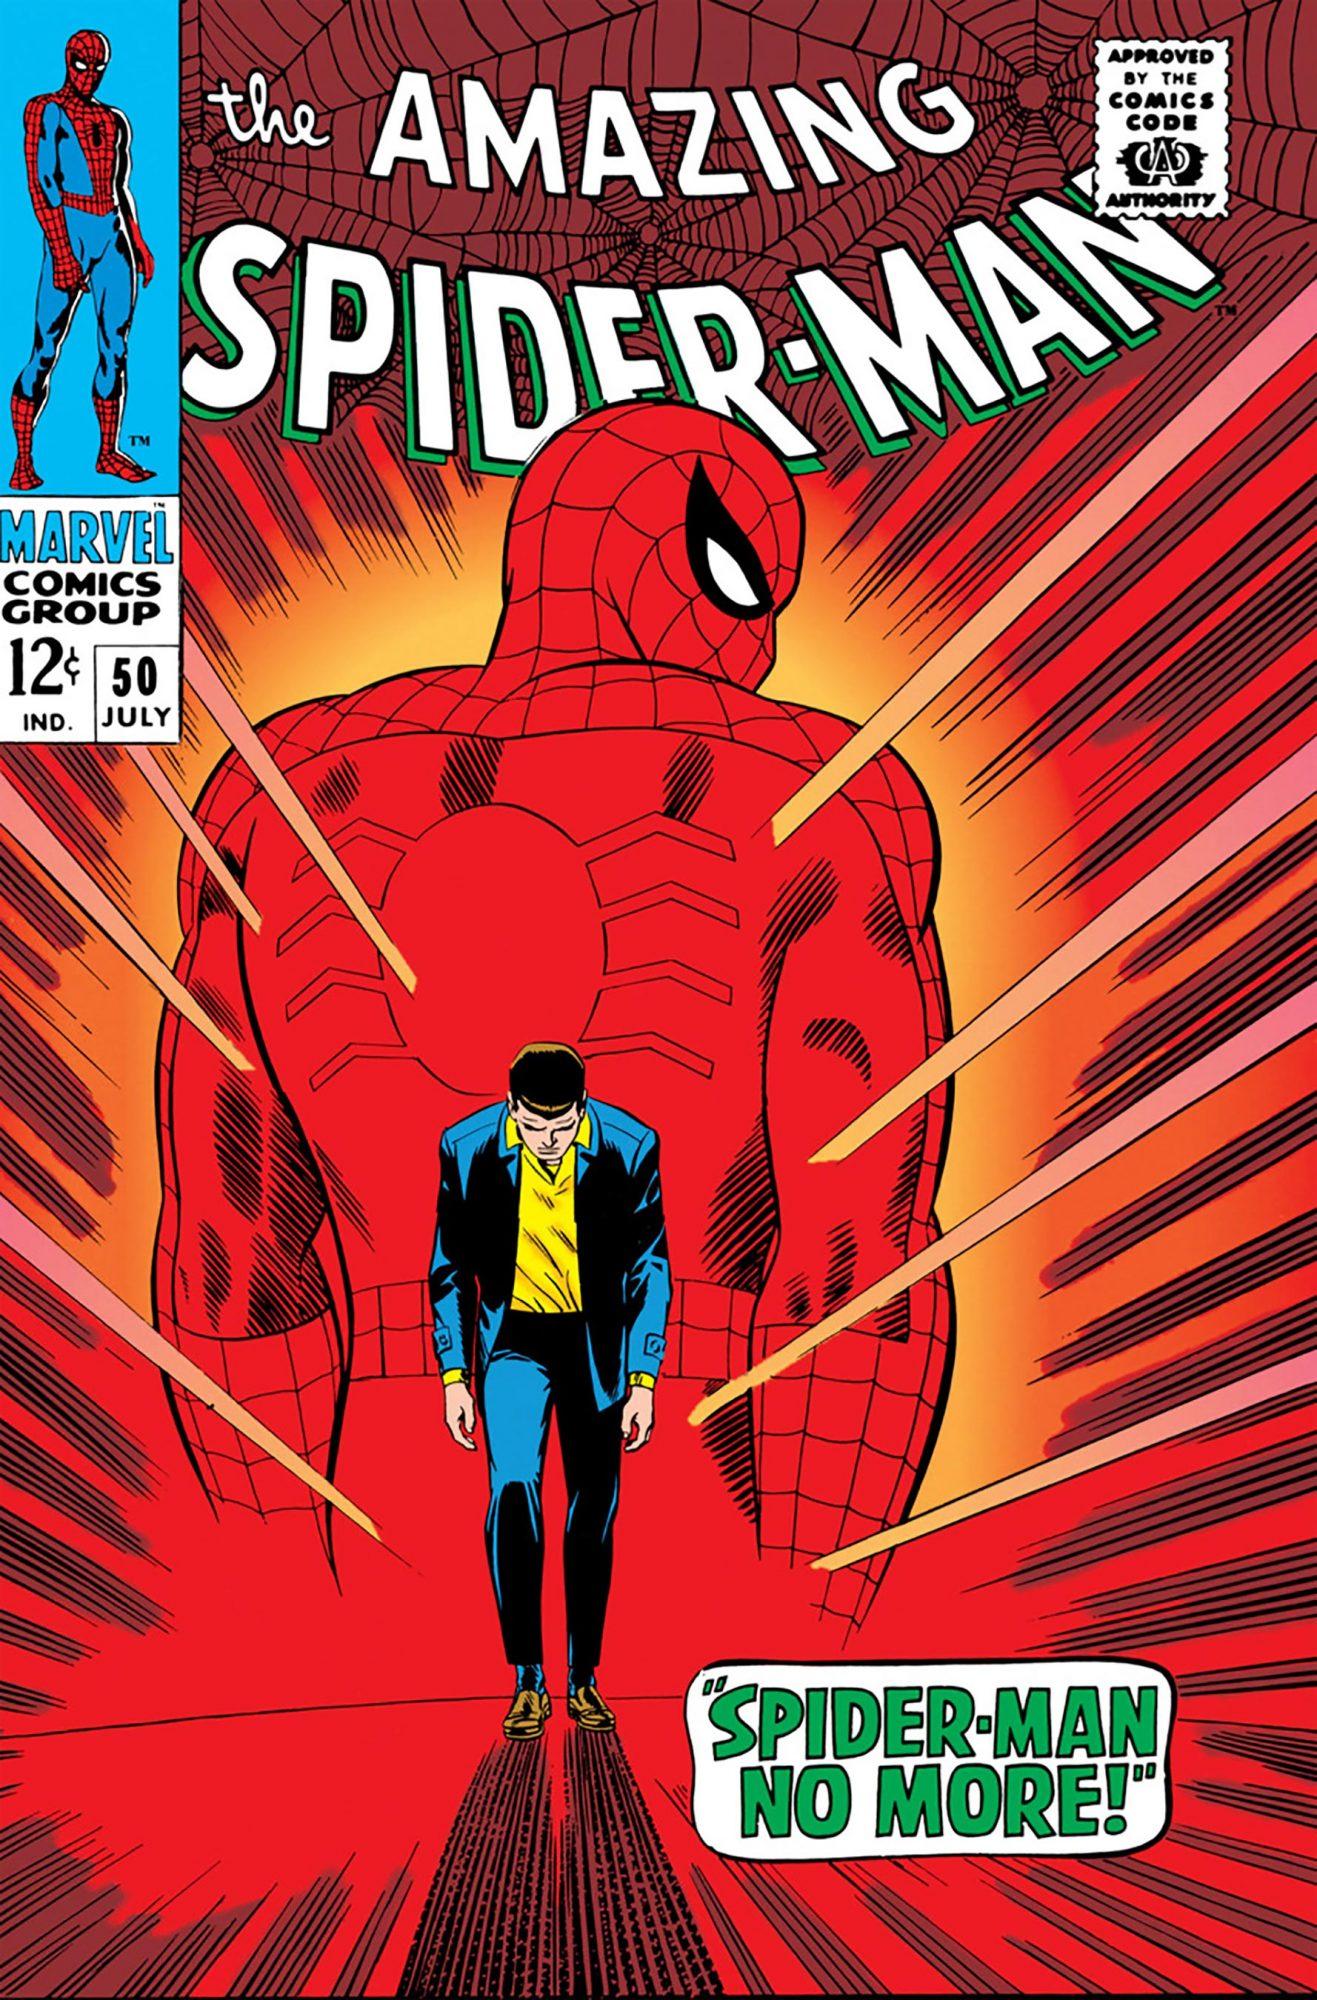 Amazing Spider-Man #50Artist: John Romita Sr., 1967